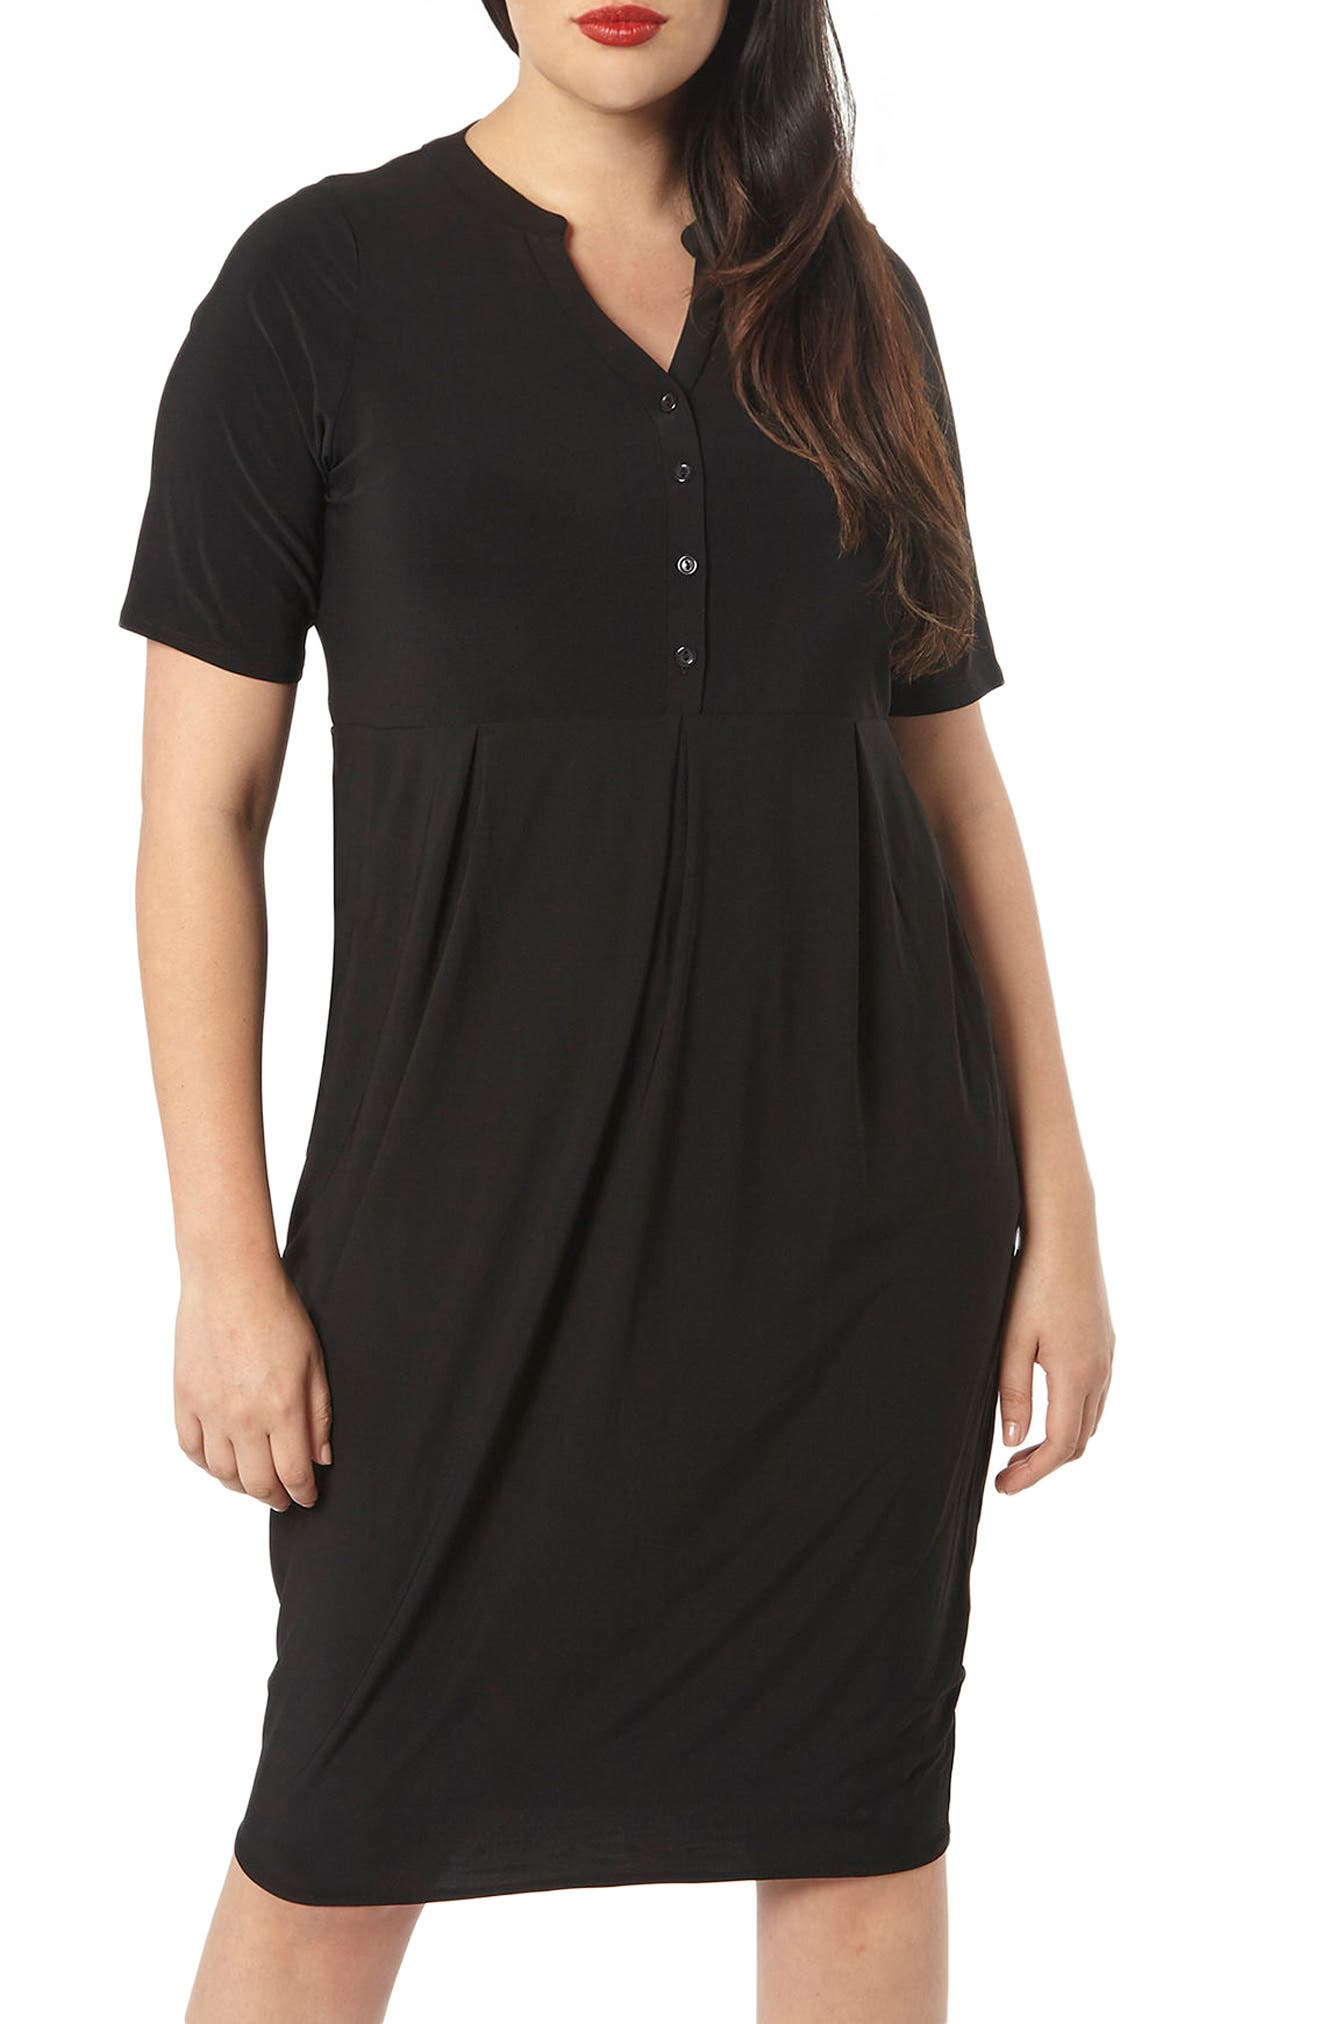 Alternate Image 1 Selected - Evans Pleat Jersey Dress (Plus Size)